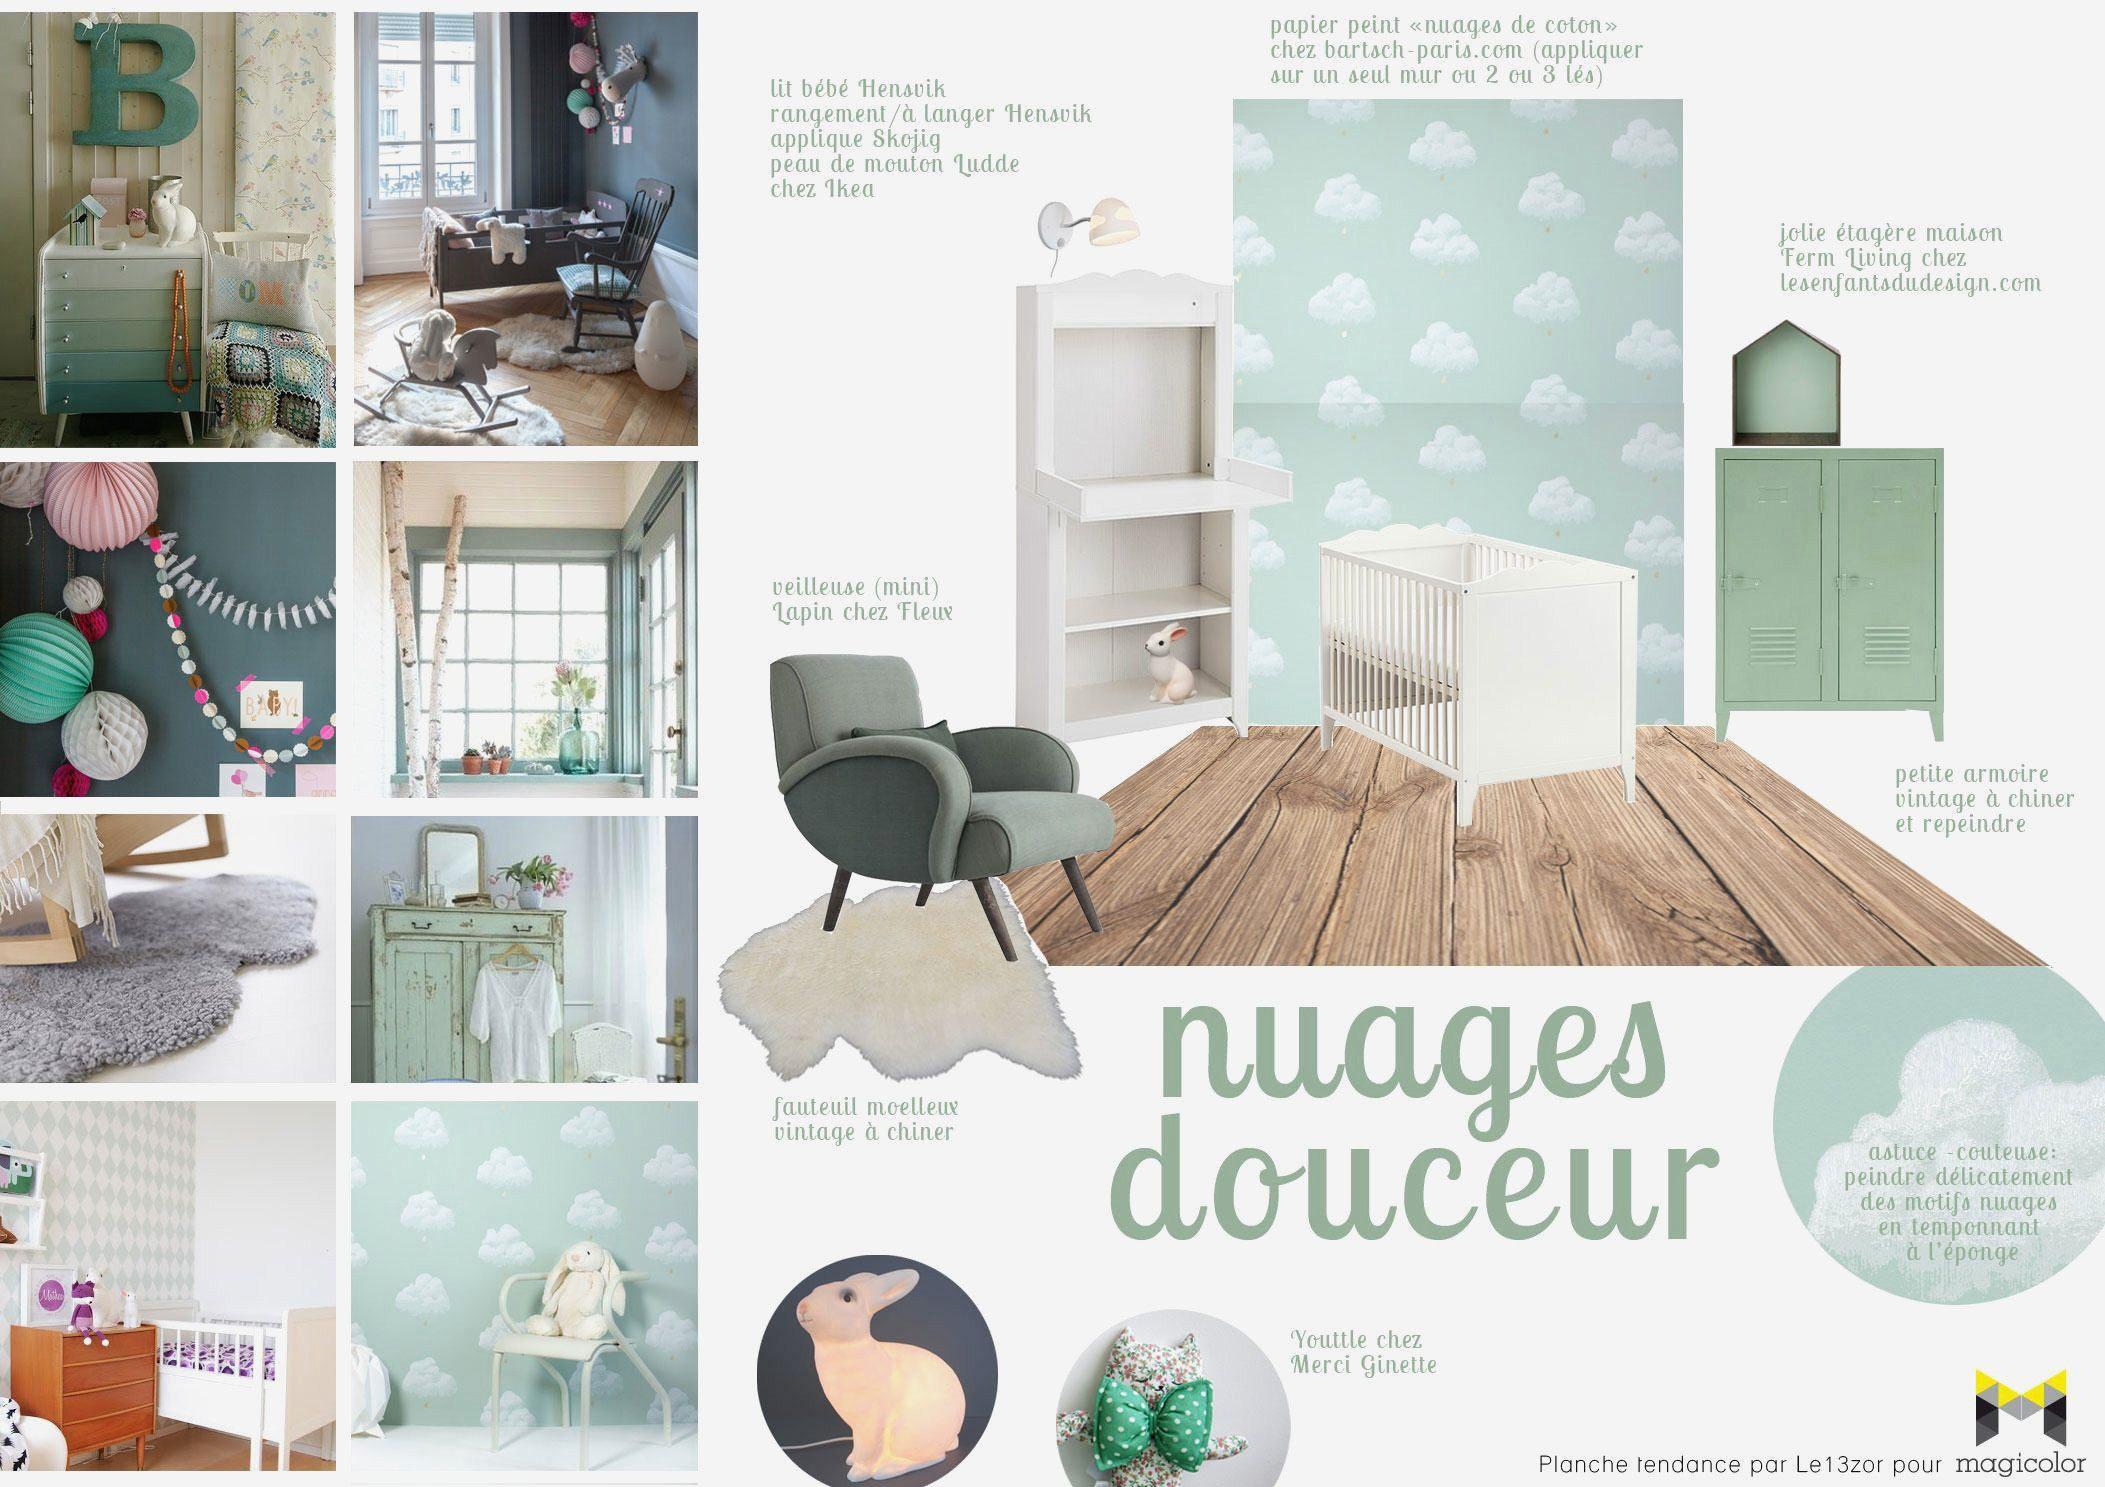 Lit Ikea Hensvik Meilleur De Kitchen Awesome Kitchen Products Amazing Home Design Contemporary